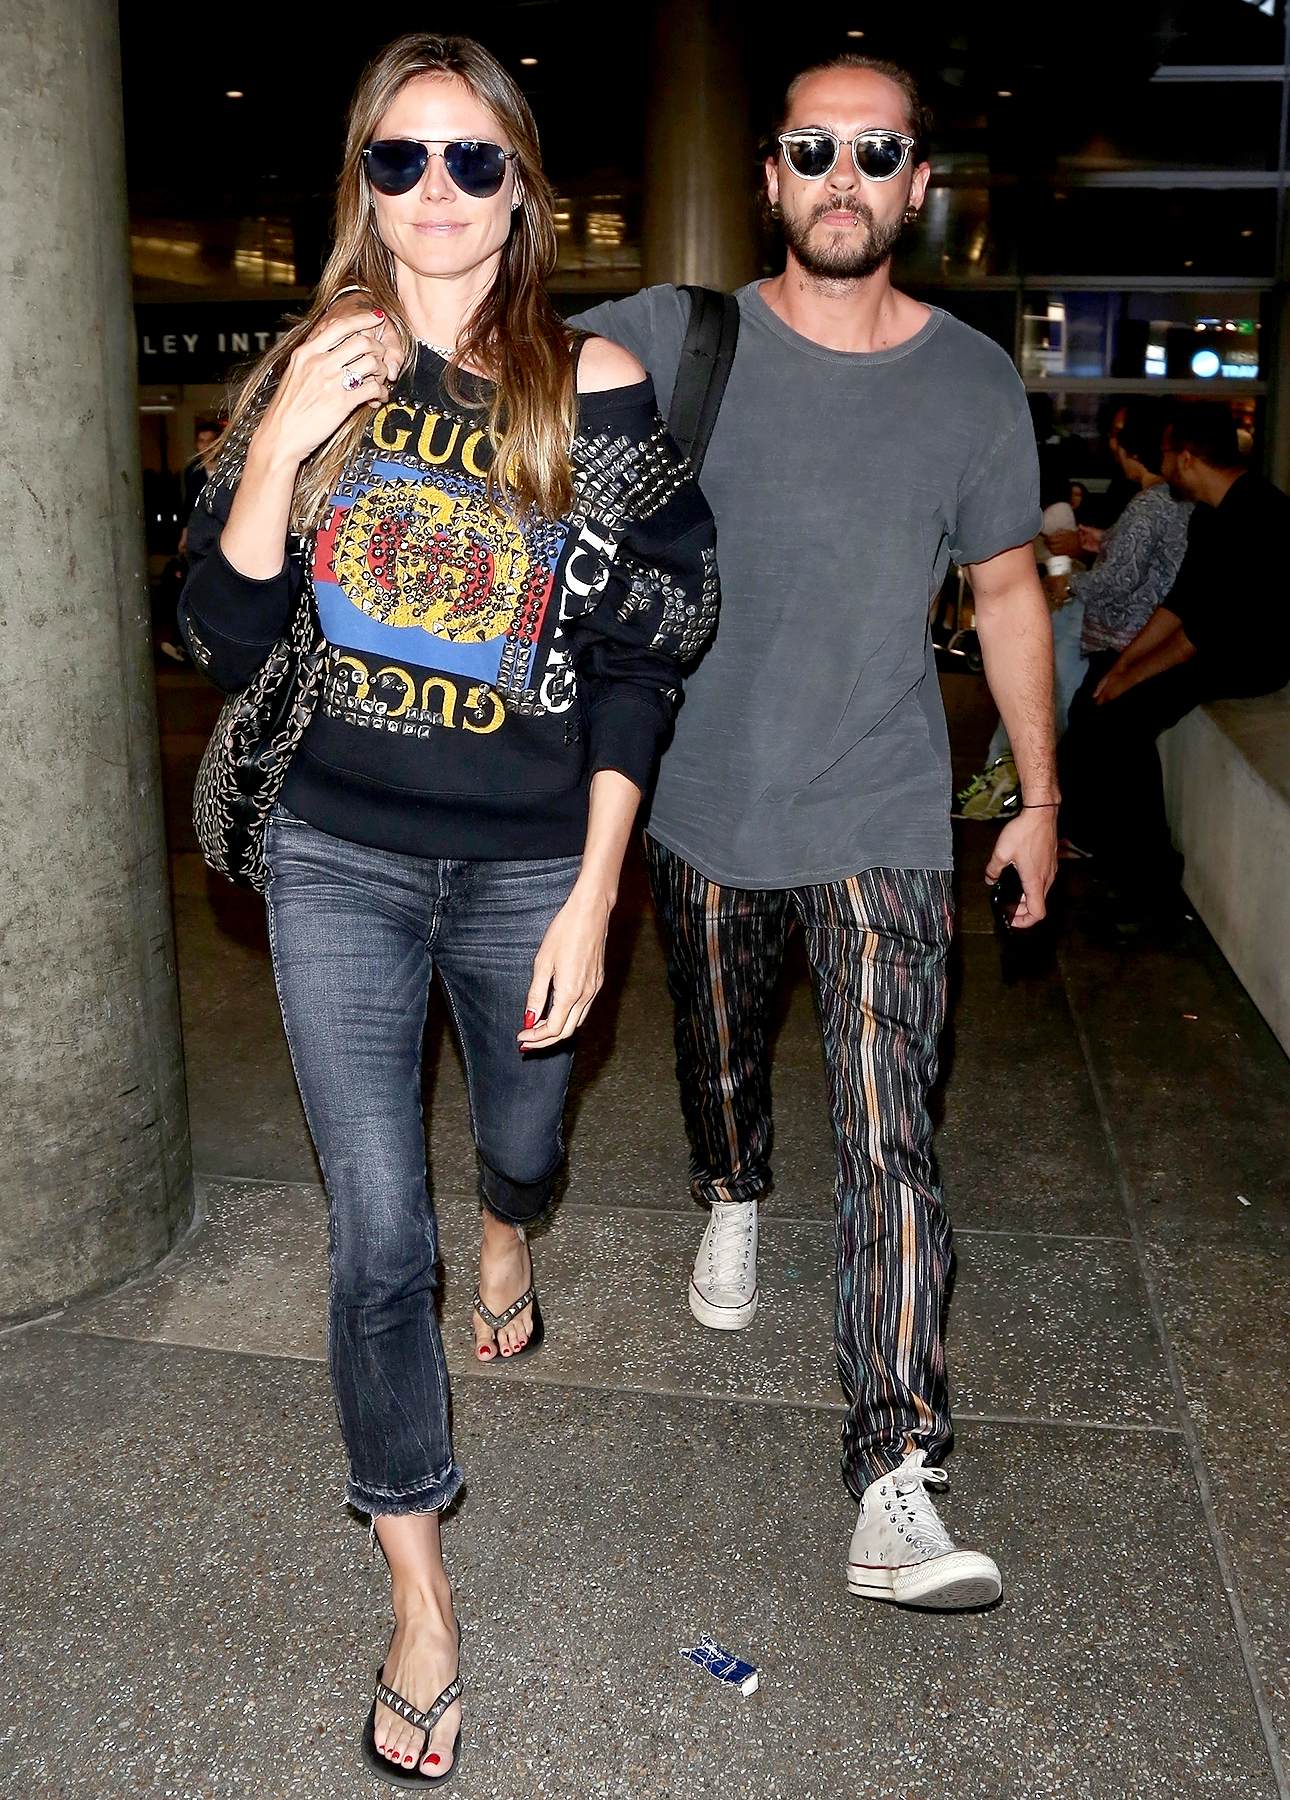 How Heidi Klum Met New Boyfriend Tom Kaulitz